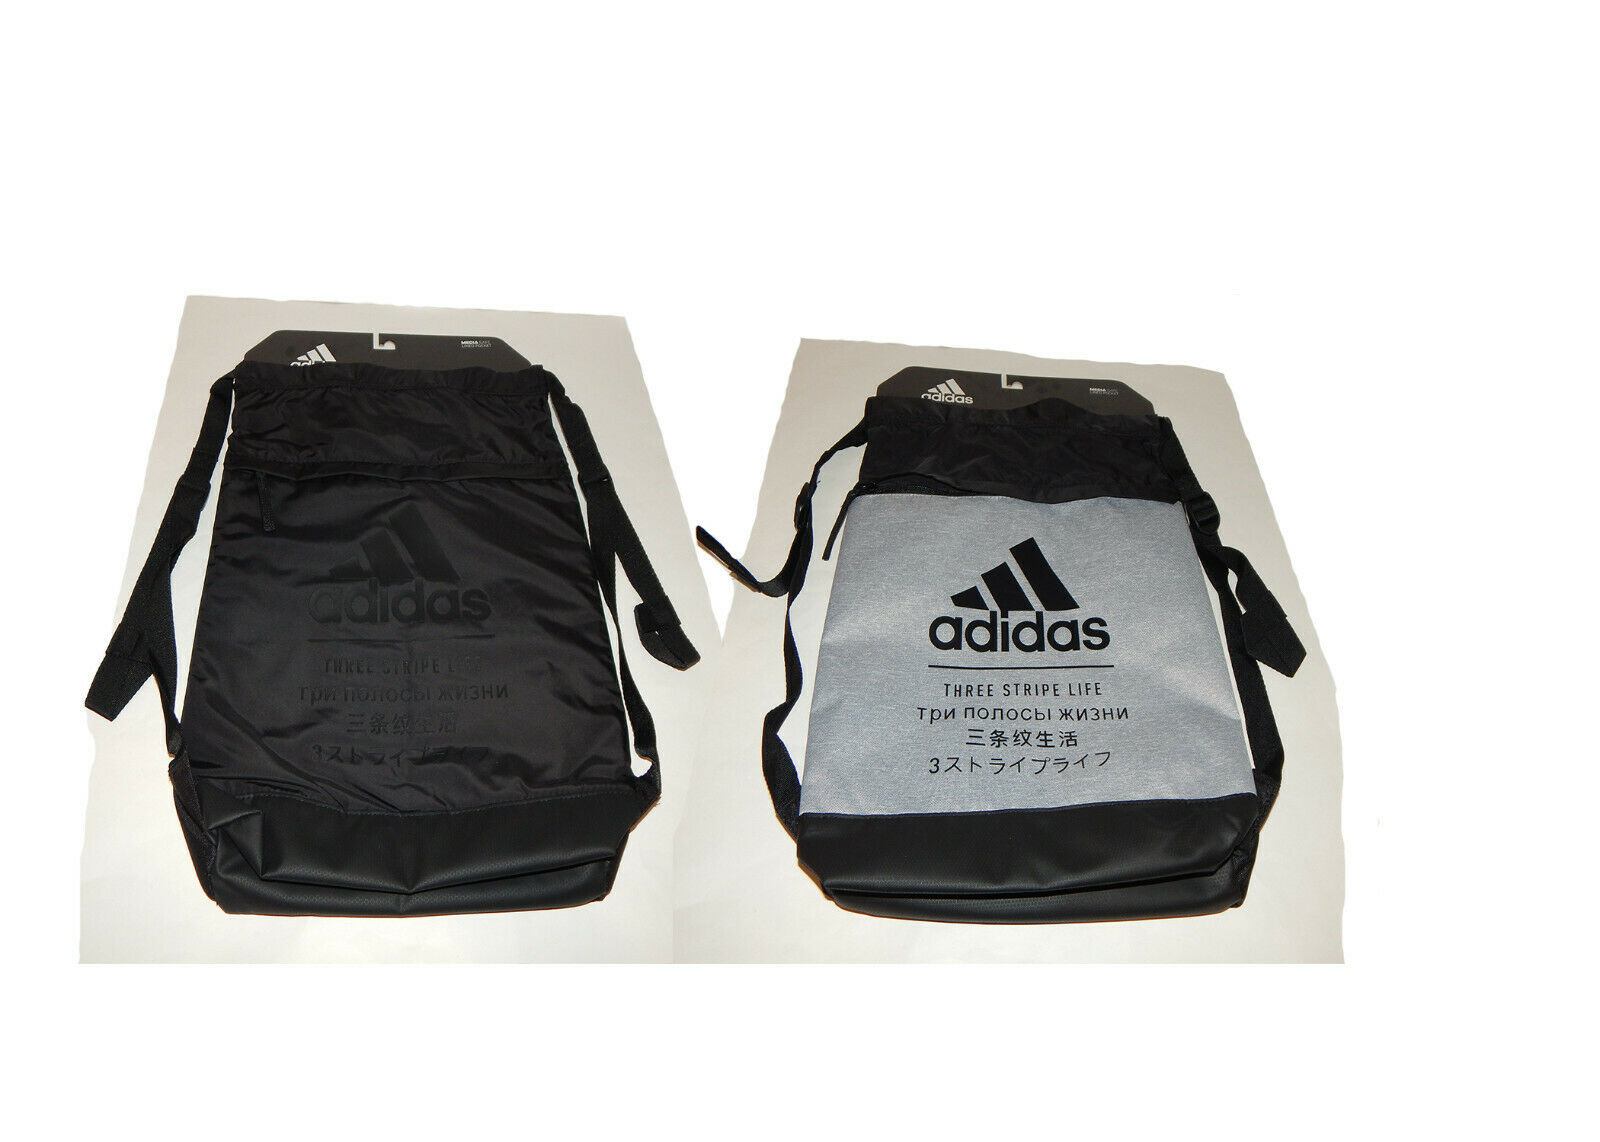 Adidas Three Stripe Life Sackpack Backpack Black OR Grey Sch